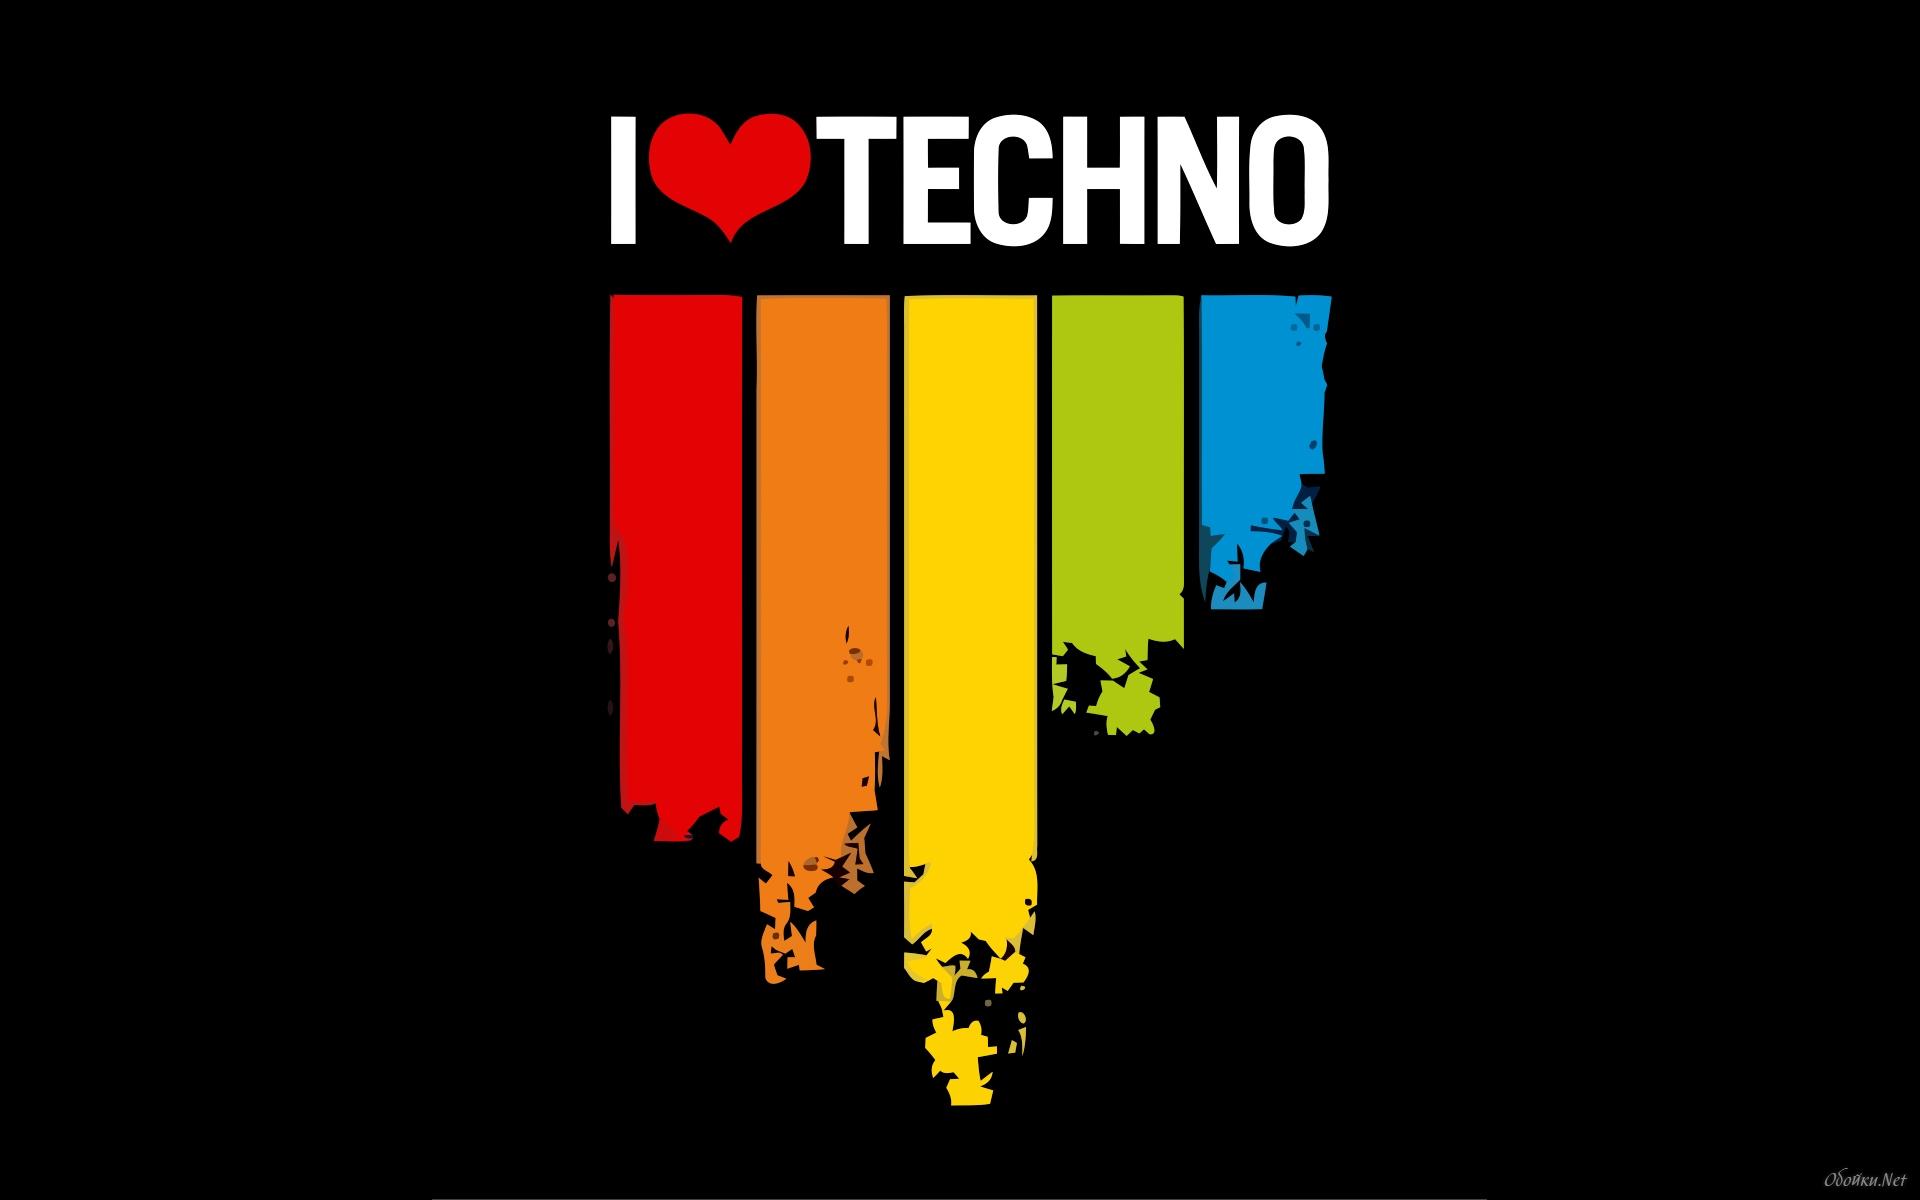 techno rainbow background - photo #31